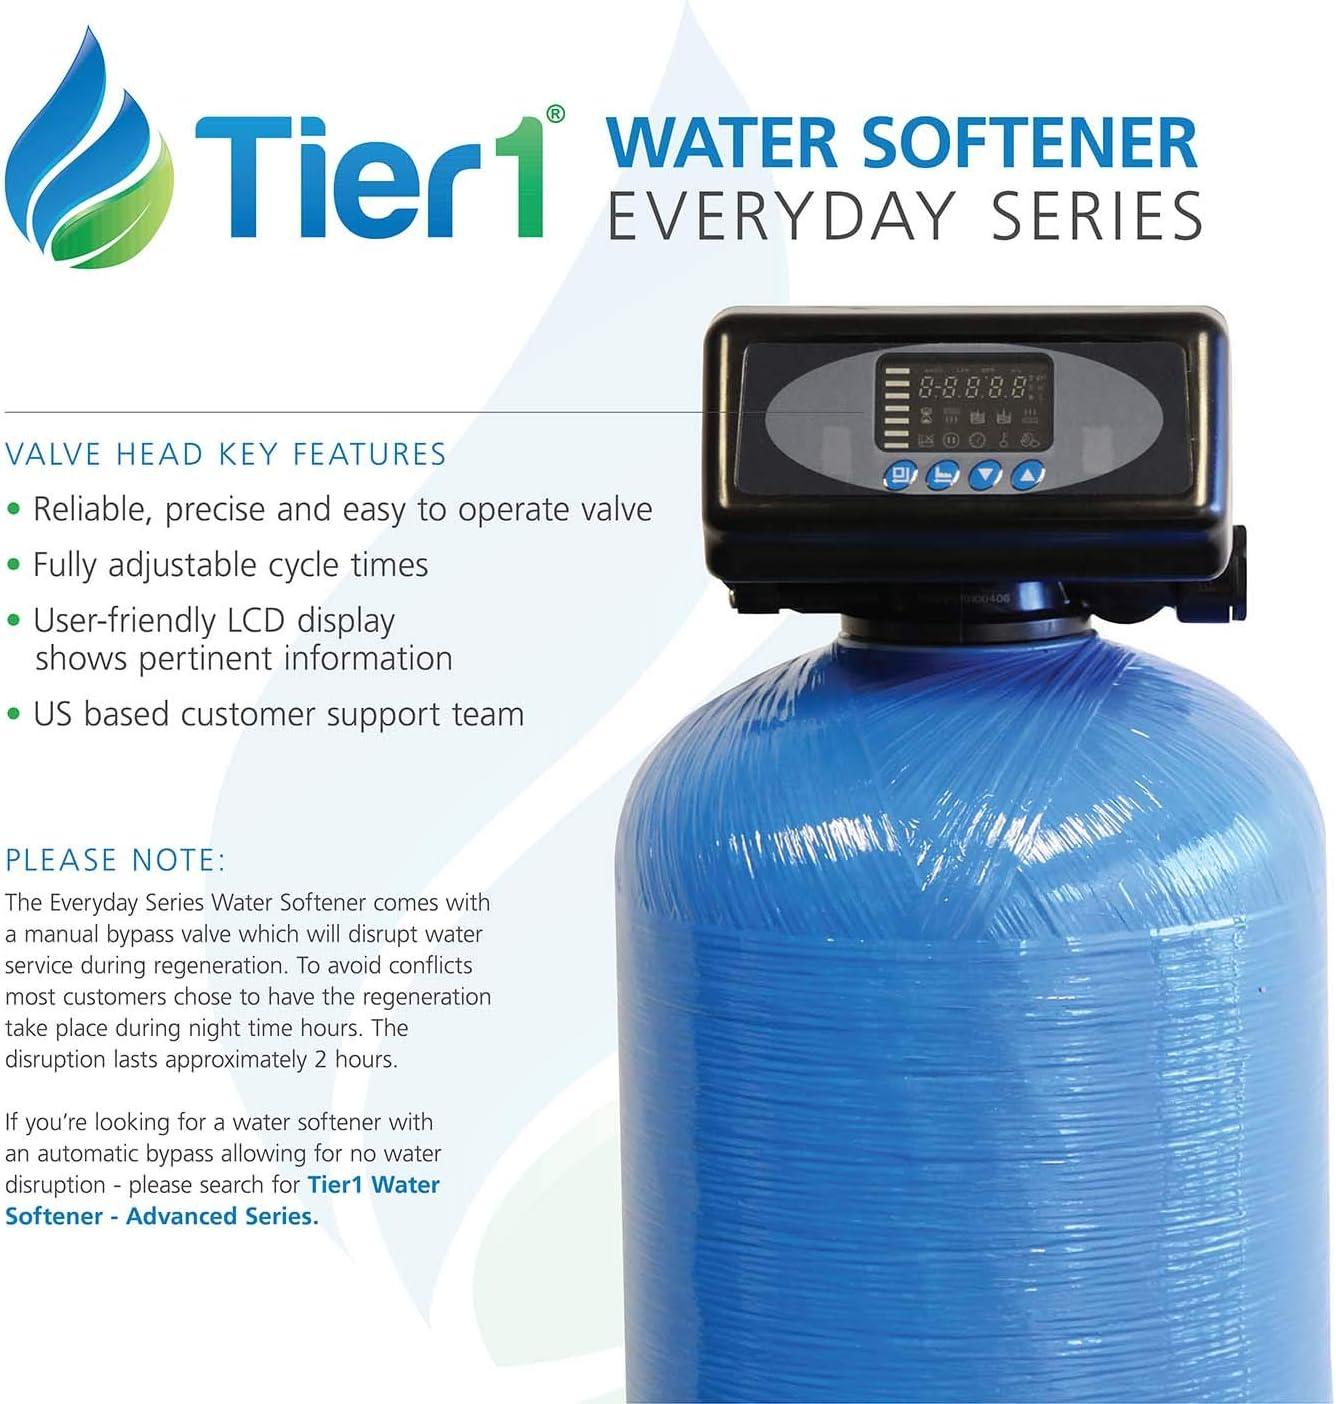 Tier1 48,000 Grain Water Softener everyday series